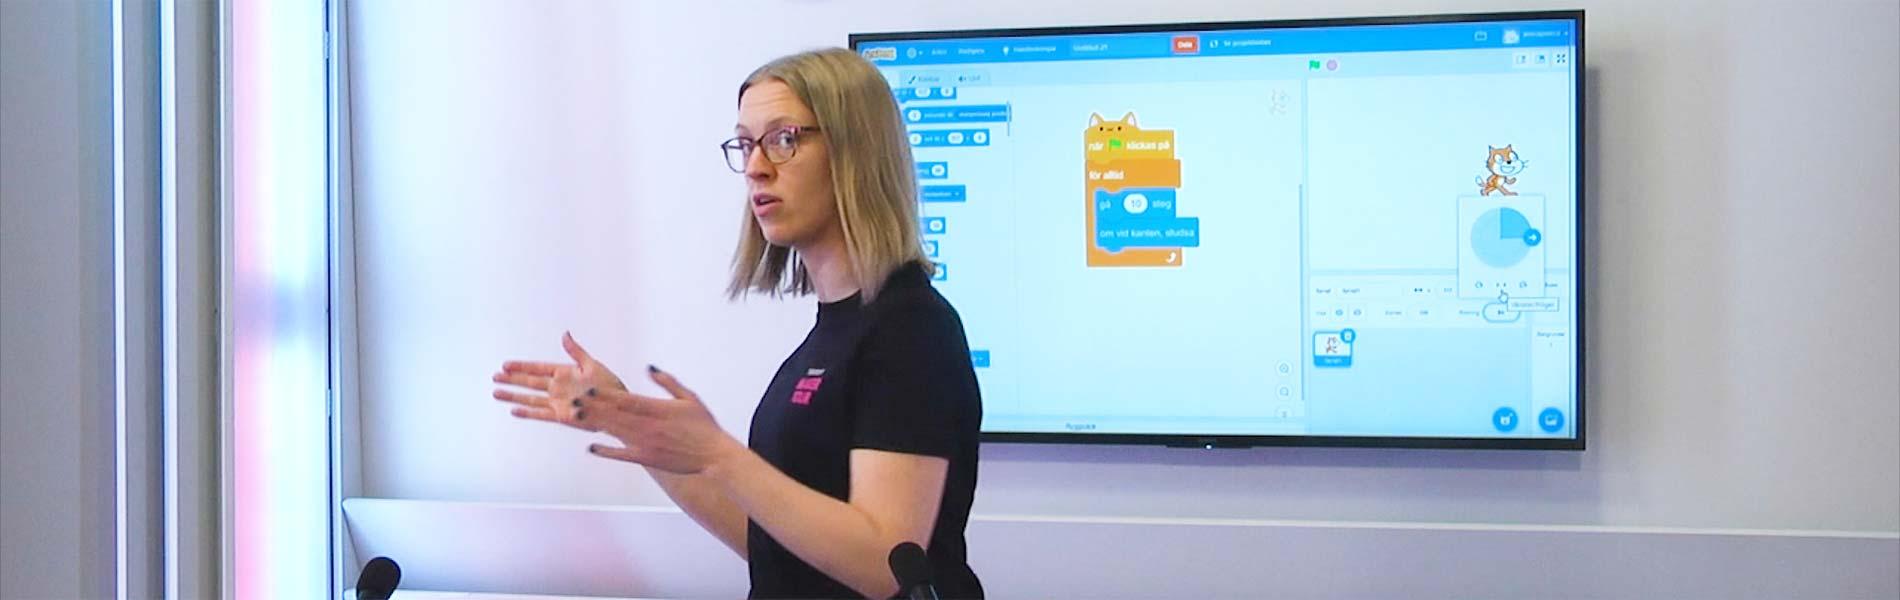 Vår pedagog Jenny håller Scratch-kurs